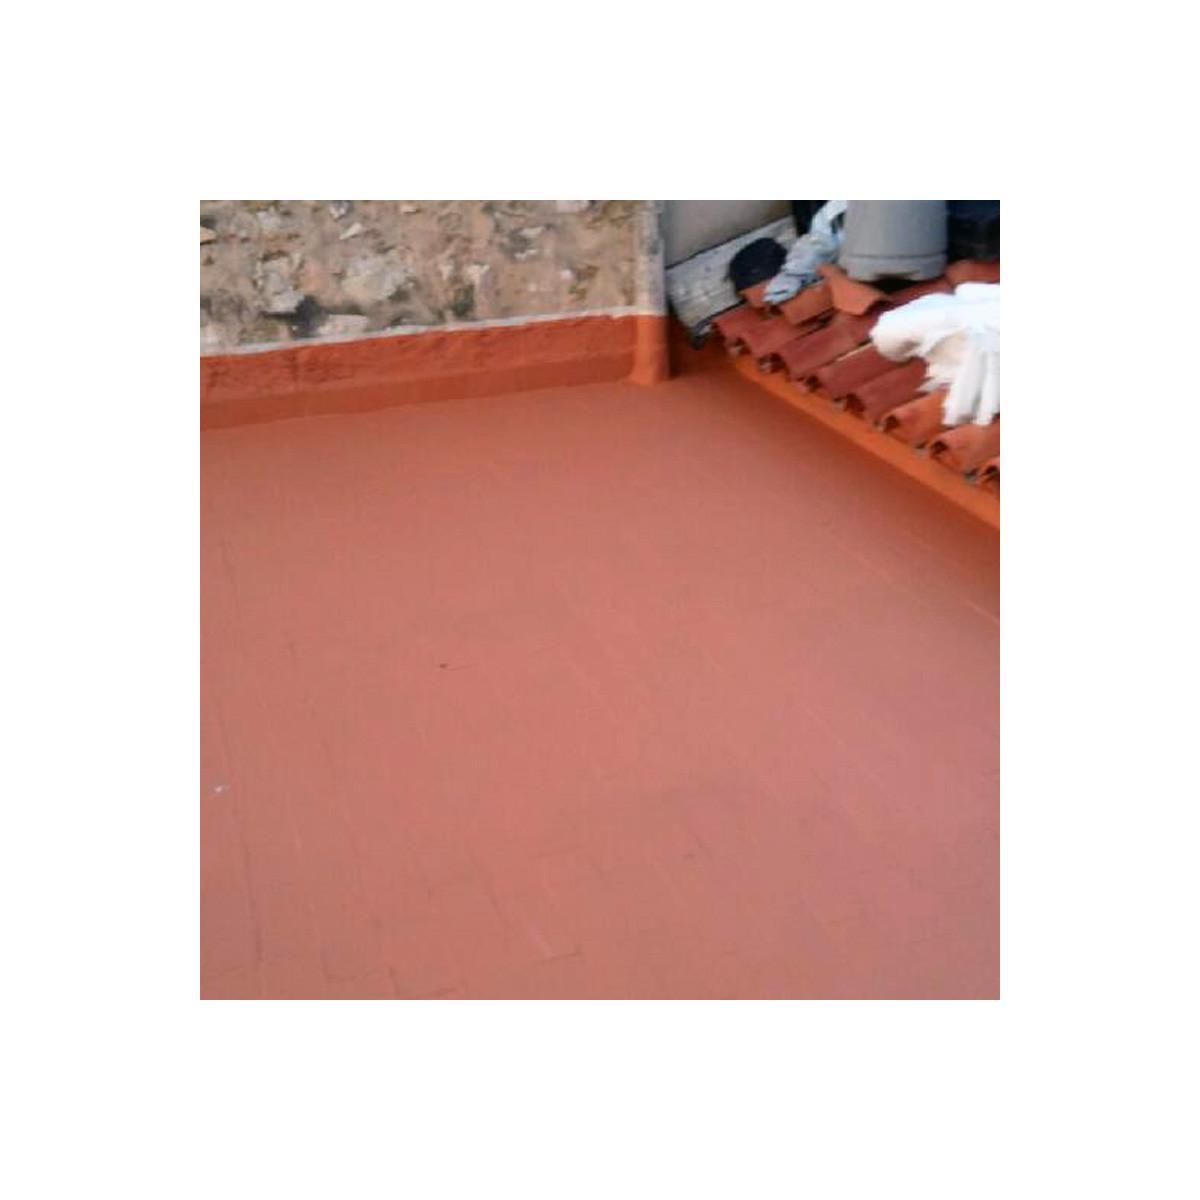 Peinture etancheite toit fissure infiltration - Etancheite mur exterieur ...